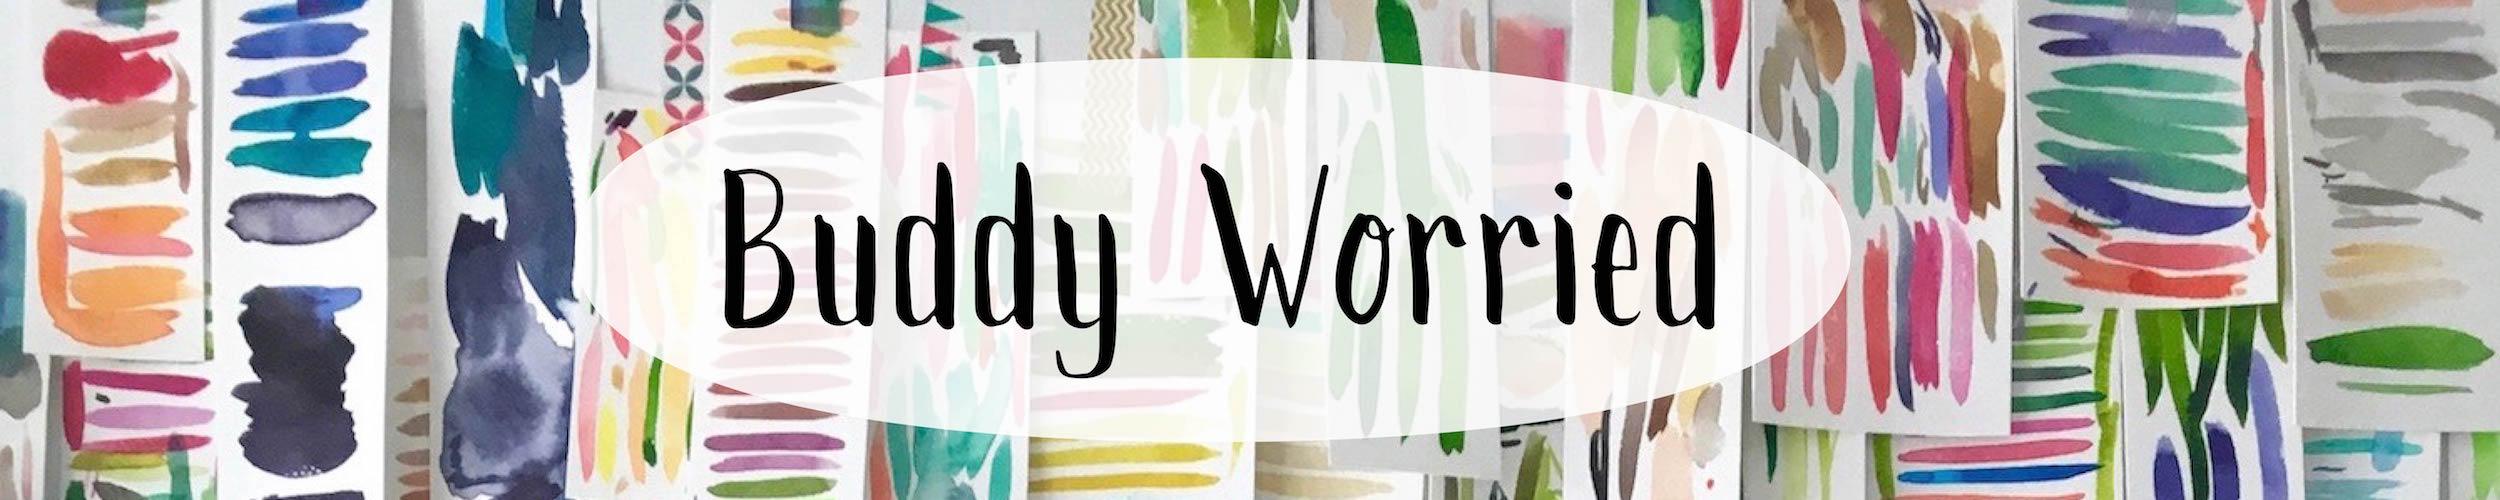 Children's Book Illustrator Amy Richards book Buddy Worried